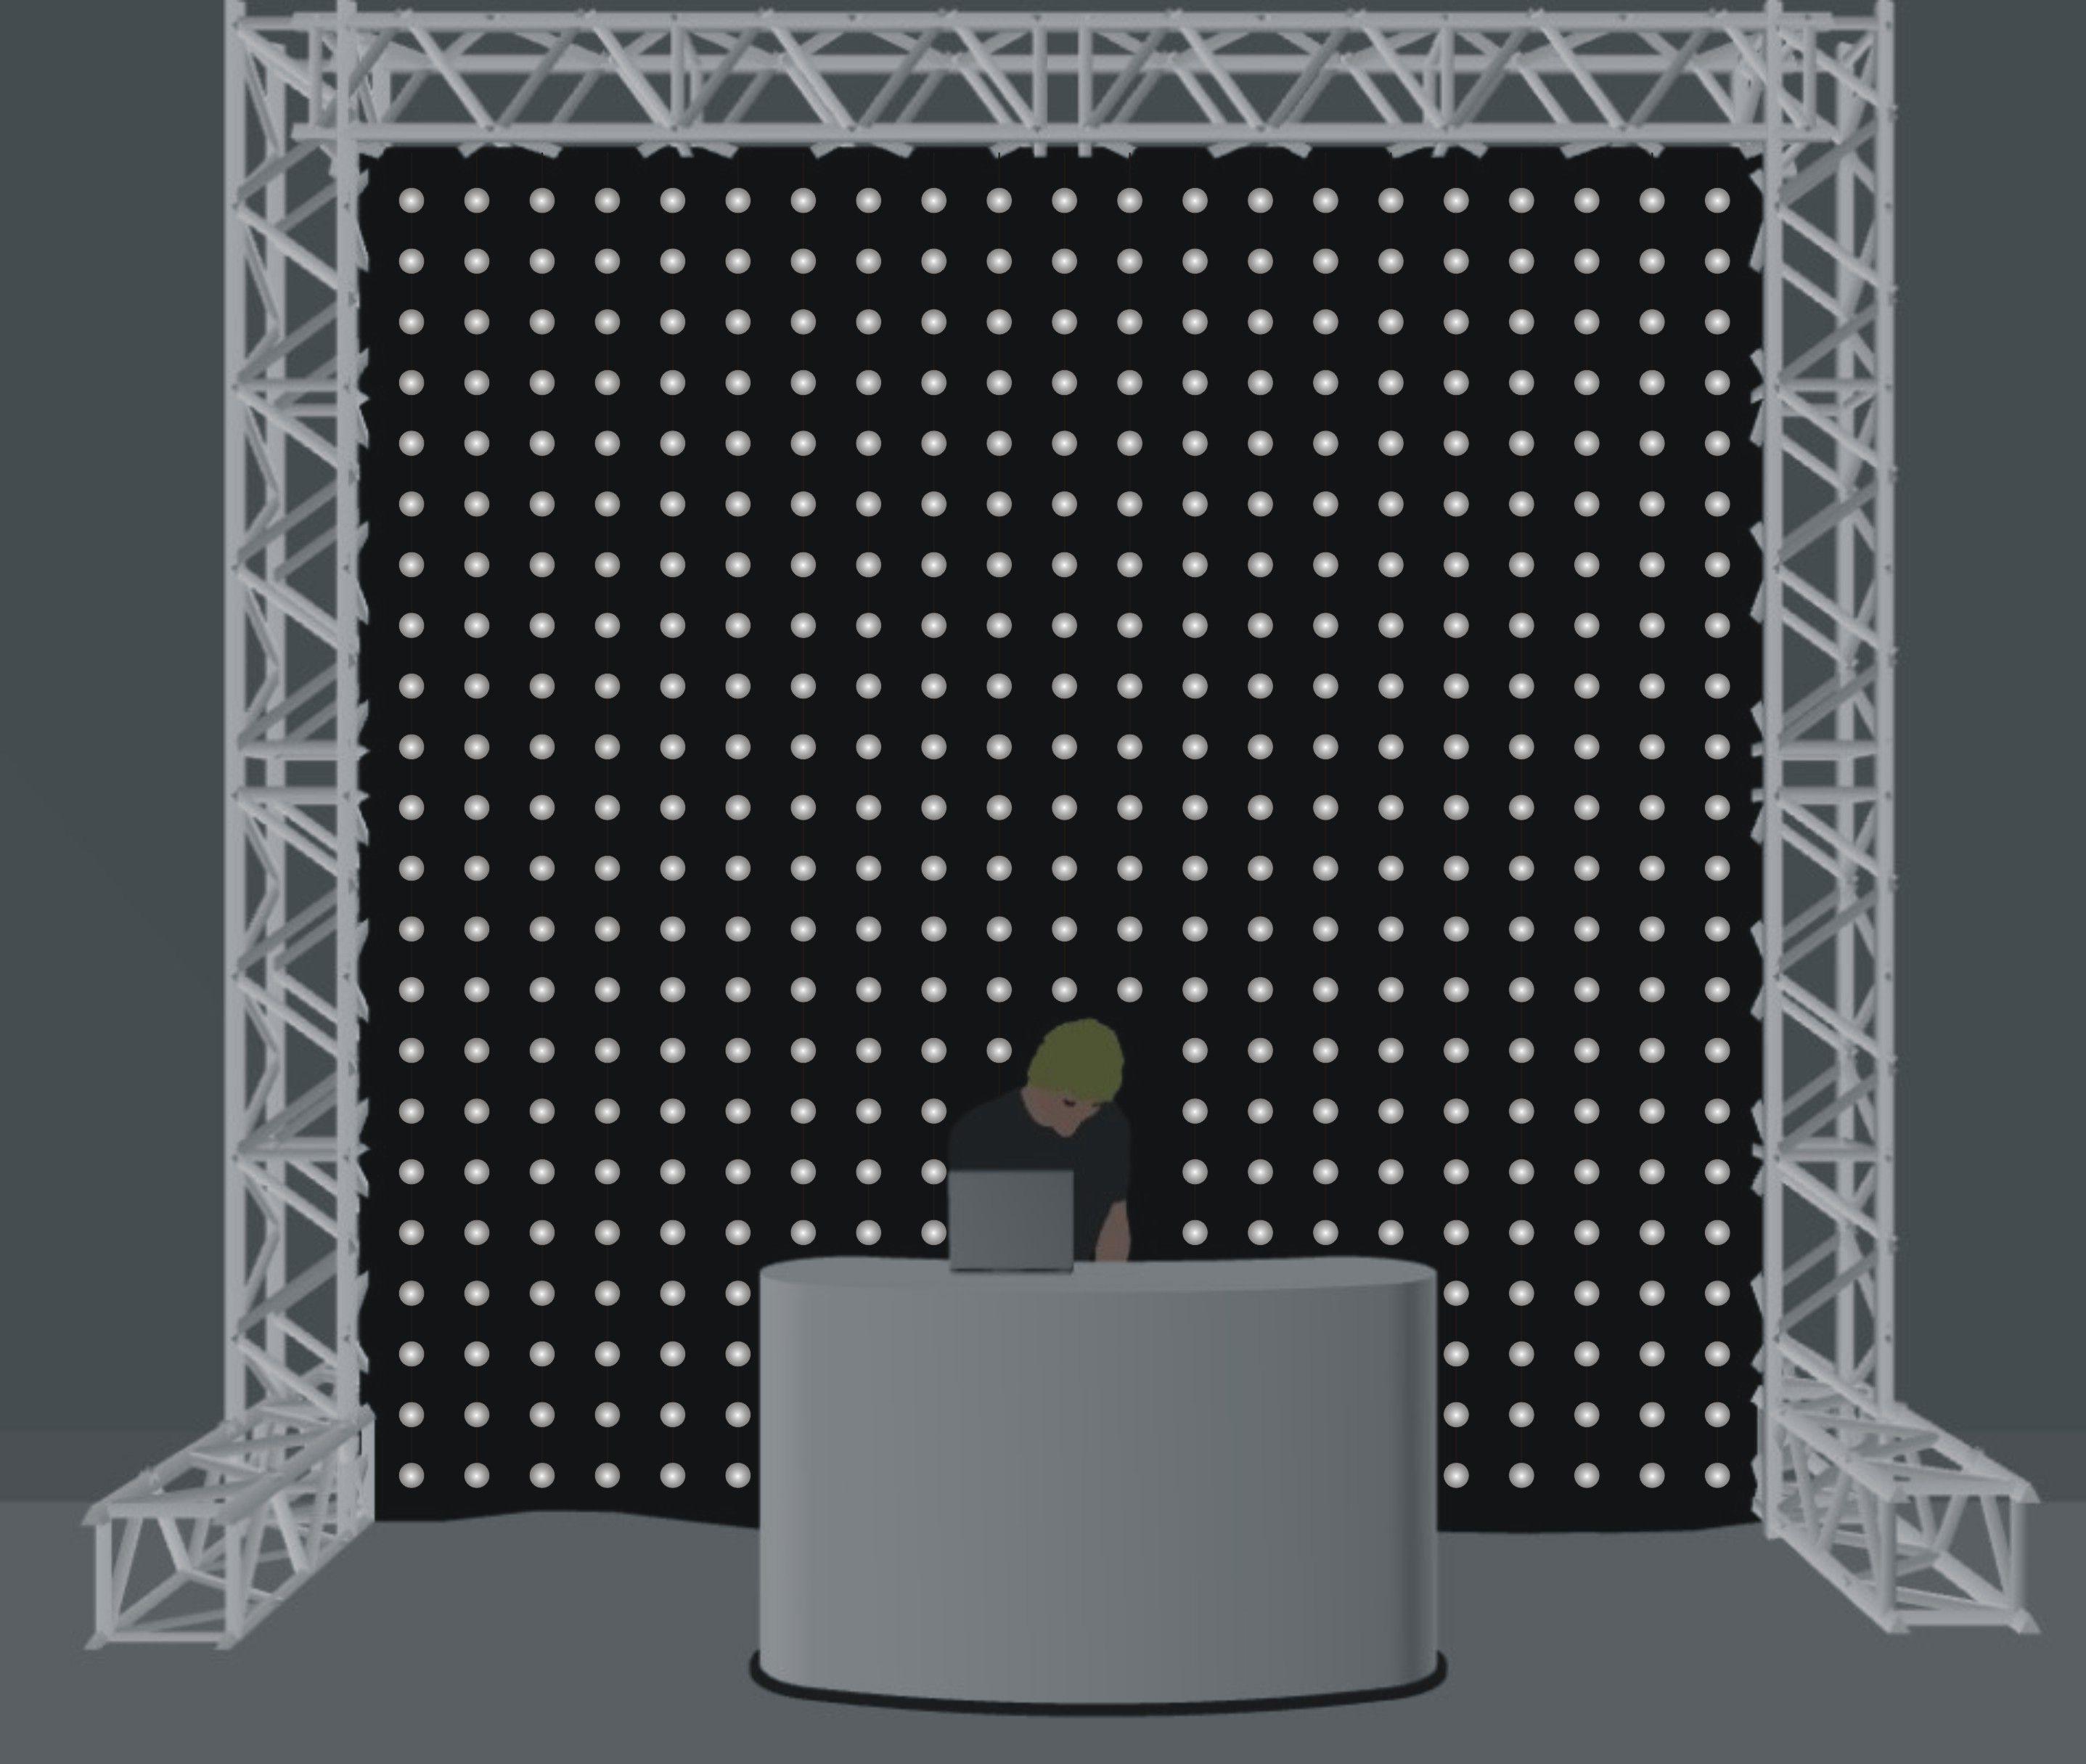 RGB LED Pixel Ball System Install Setup